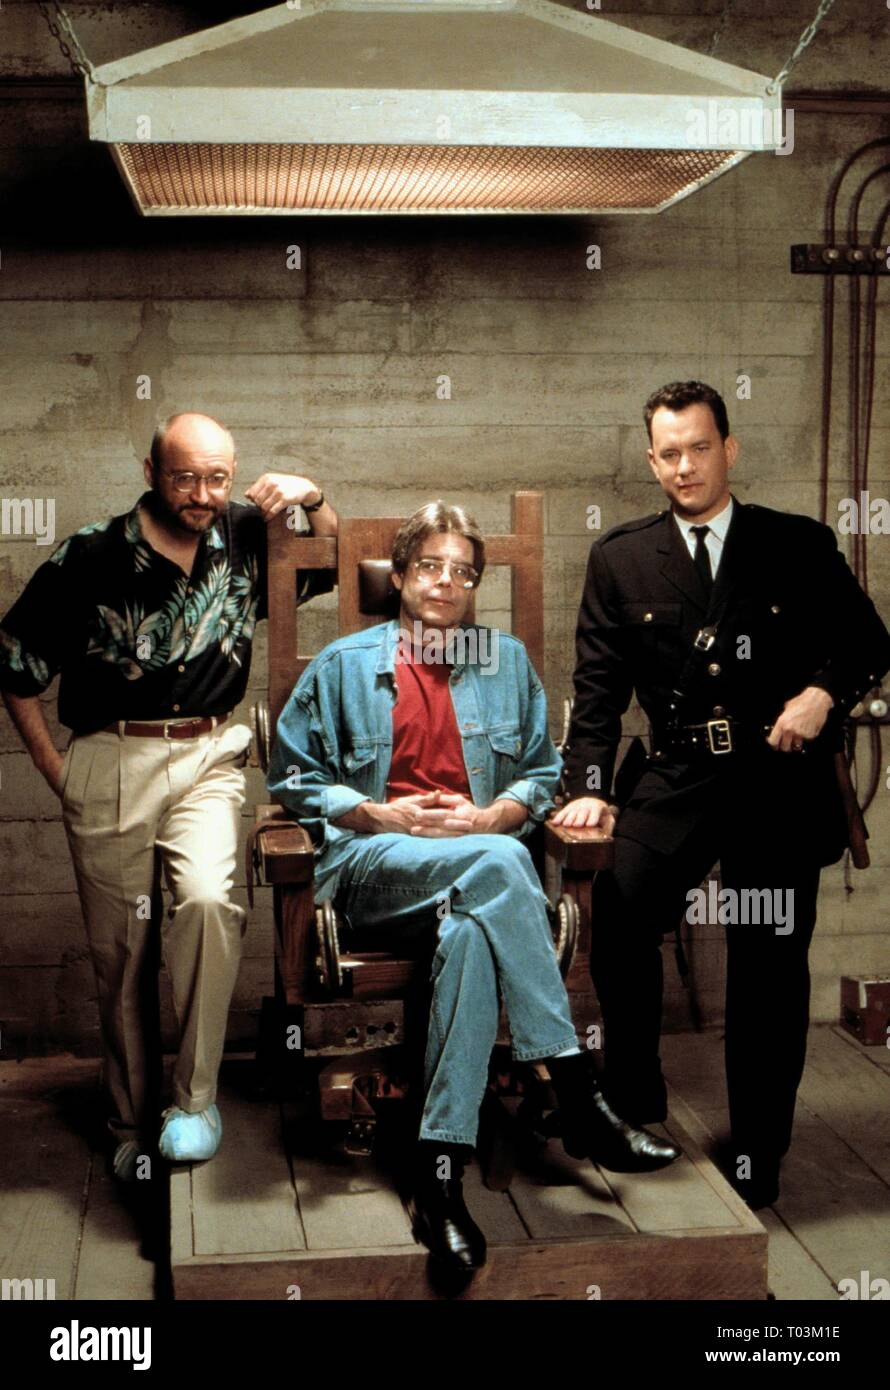 Frank Darabont Stephen King Tom Hanks The Green Mile 1999 Stock Photo Alamy